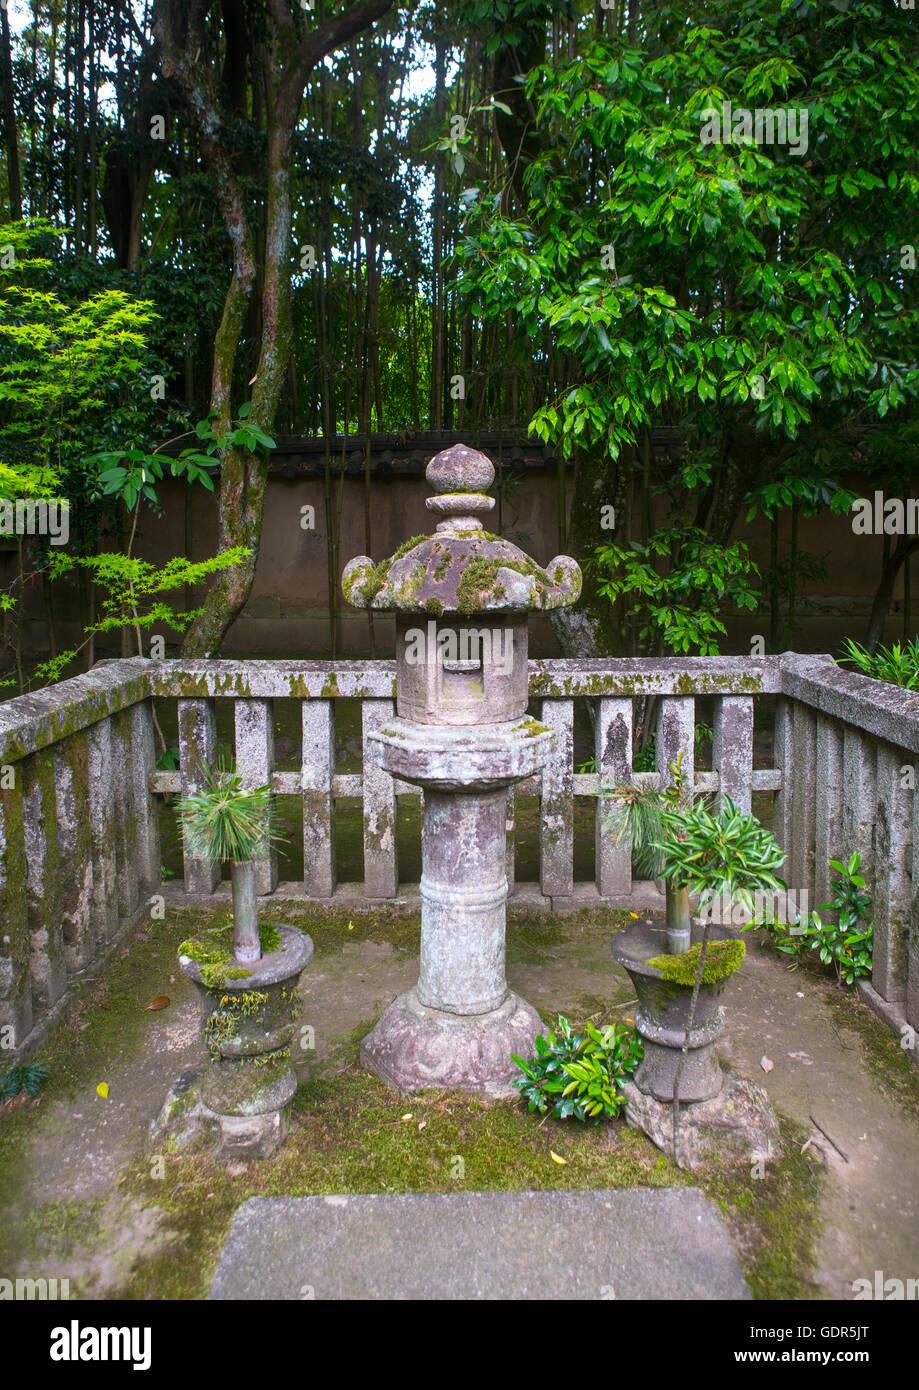 Lantern in koto-in zen buddhist temple in daitoku-ji, Kansai region, Kyoto, Japan - Stock Image